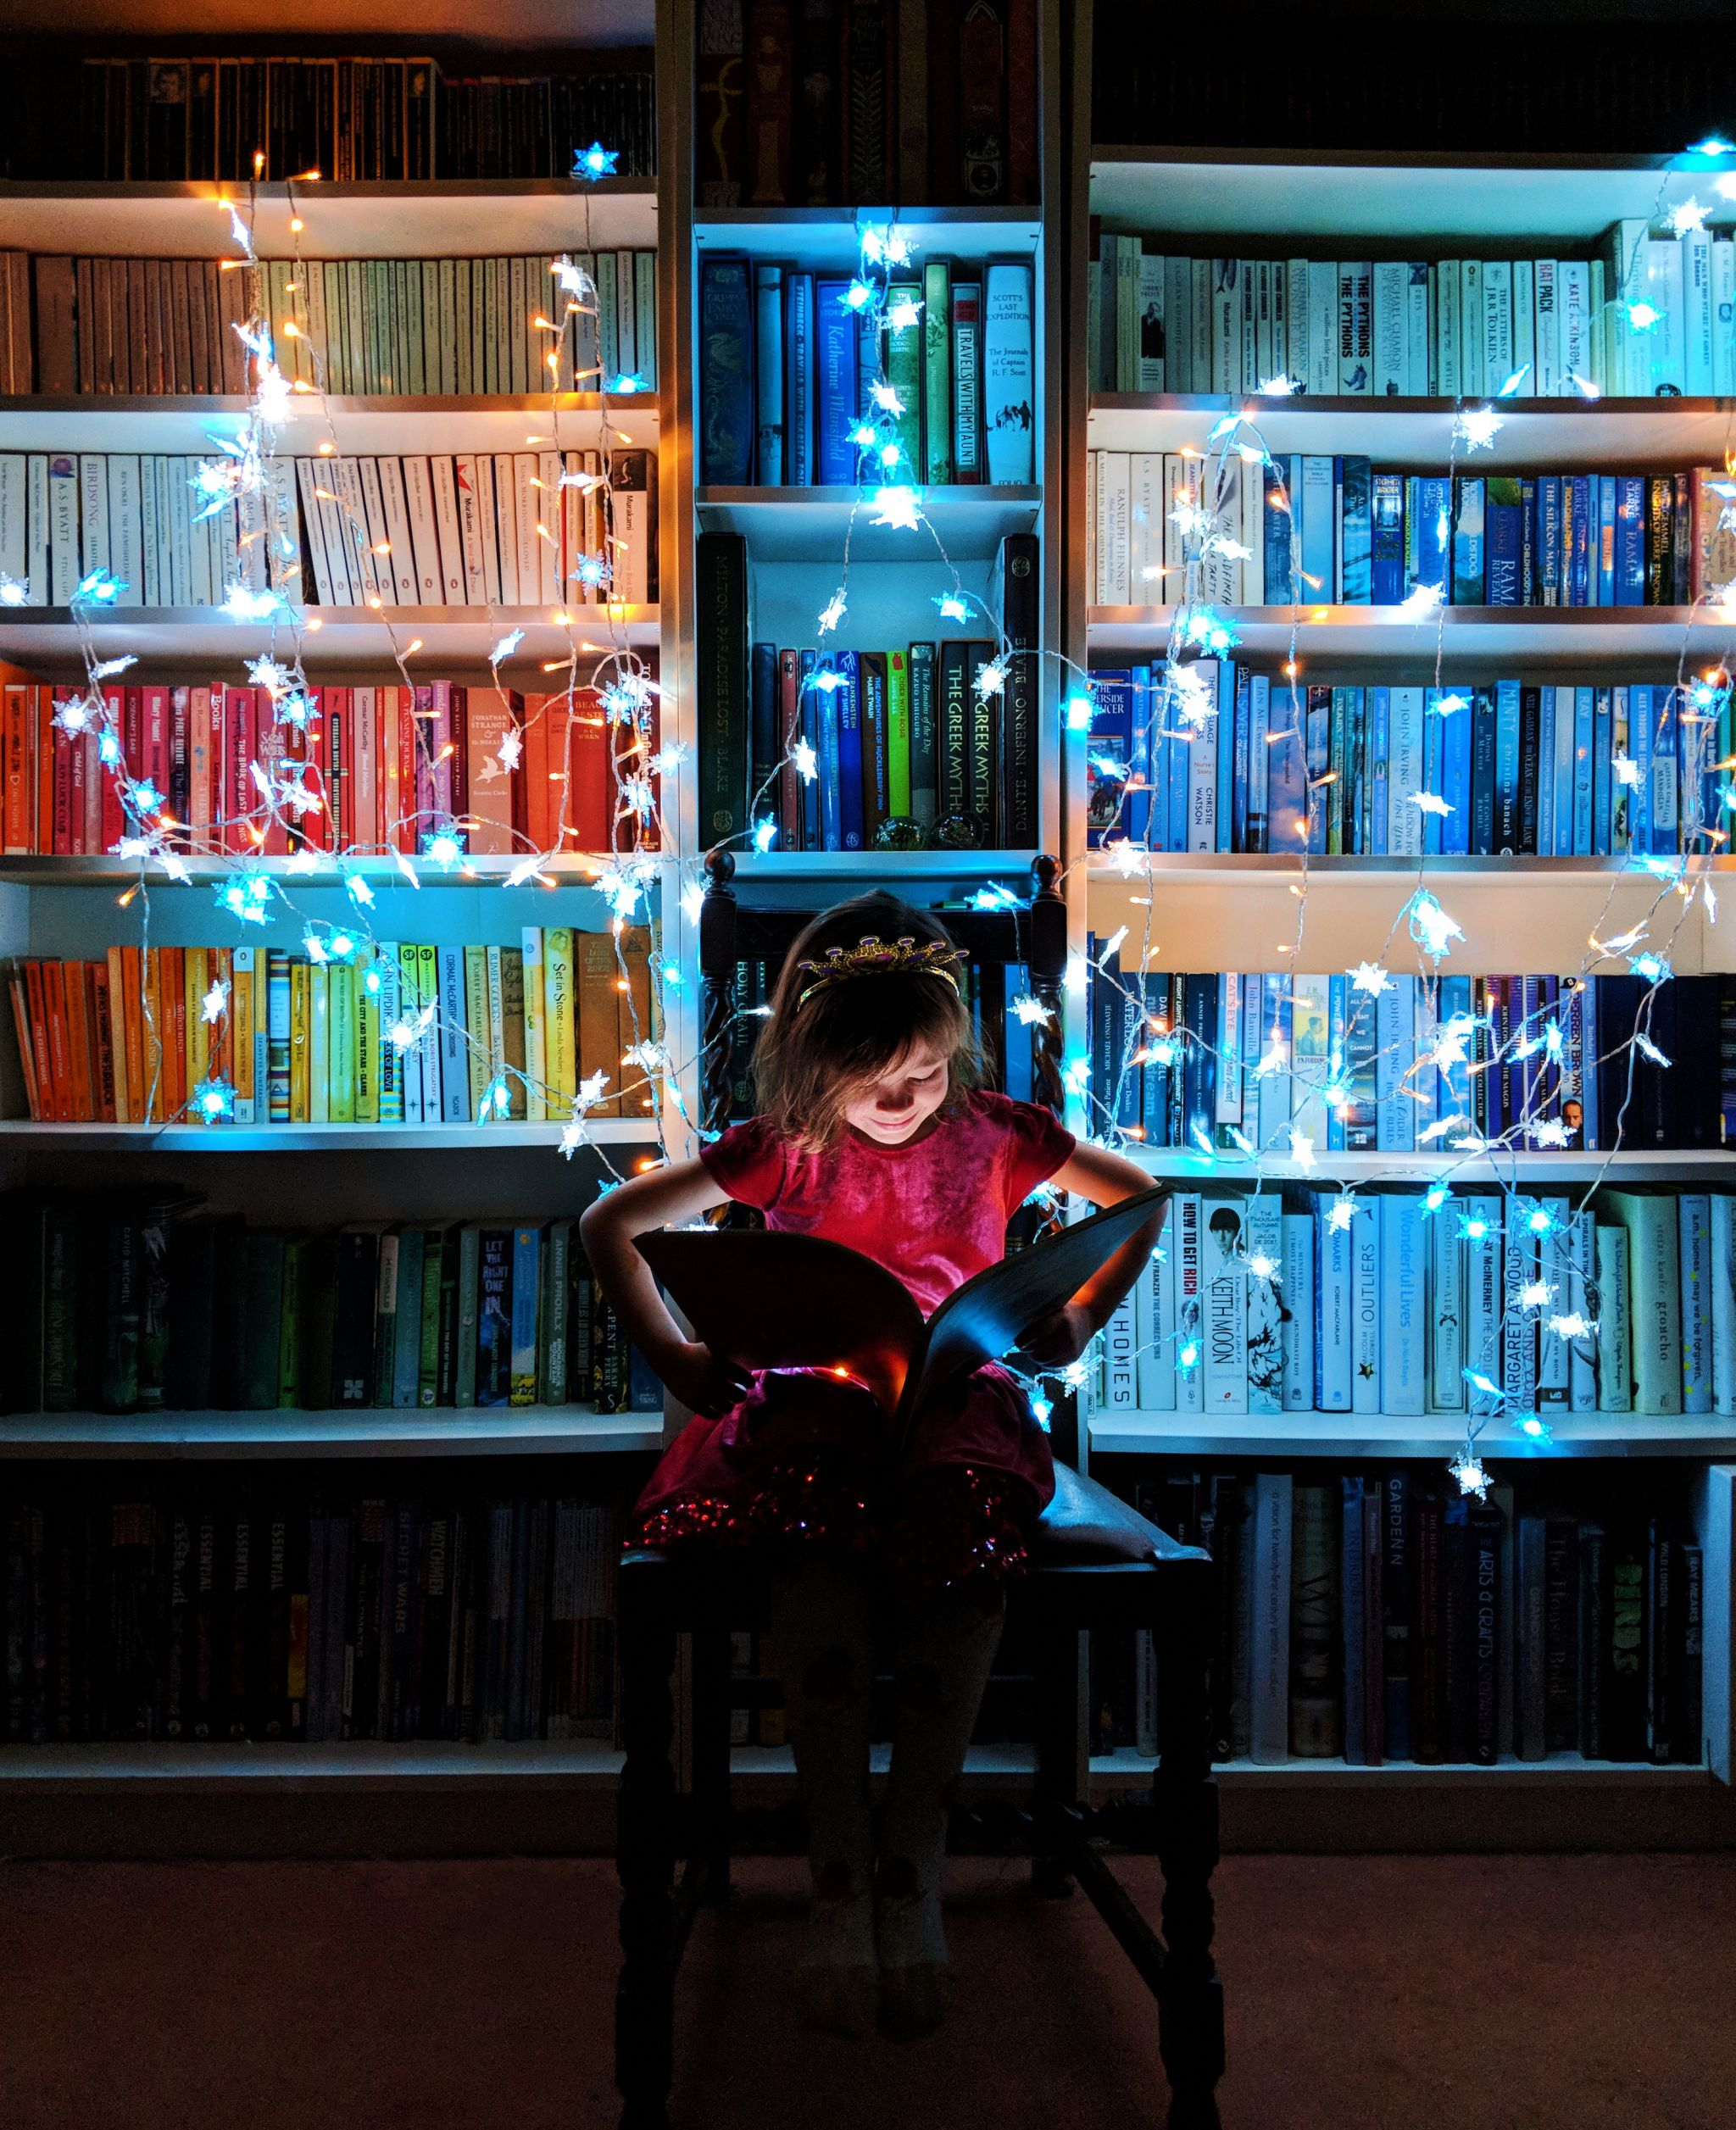 A little girl reading in front of illuminated bookshelves